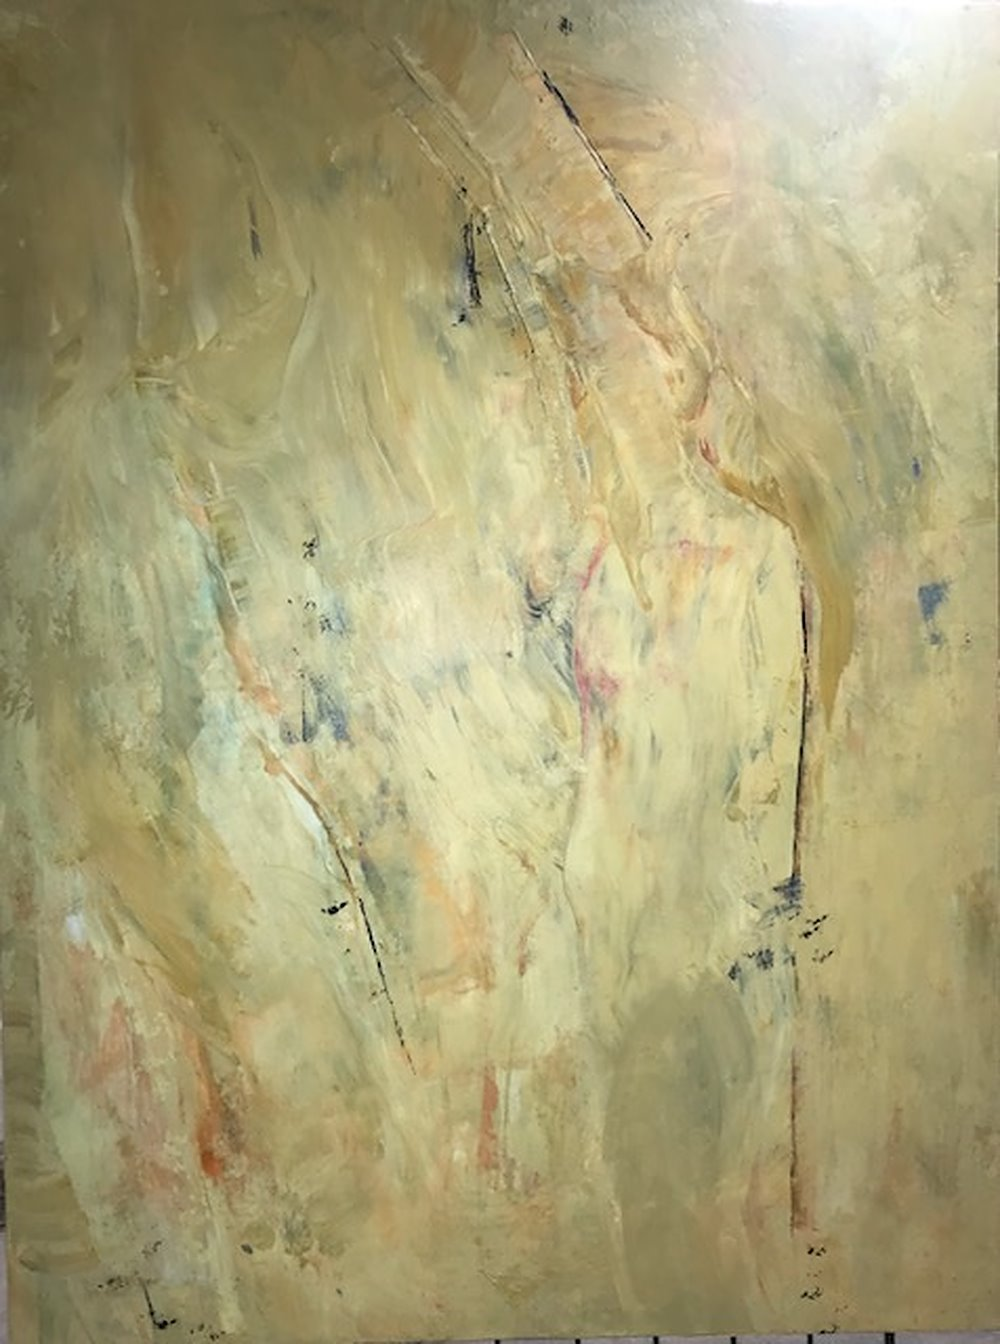 Interrupted by Robert Martinez | ArtworkNetwork.com